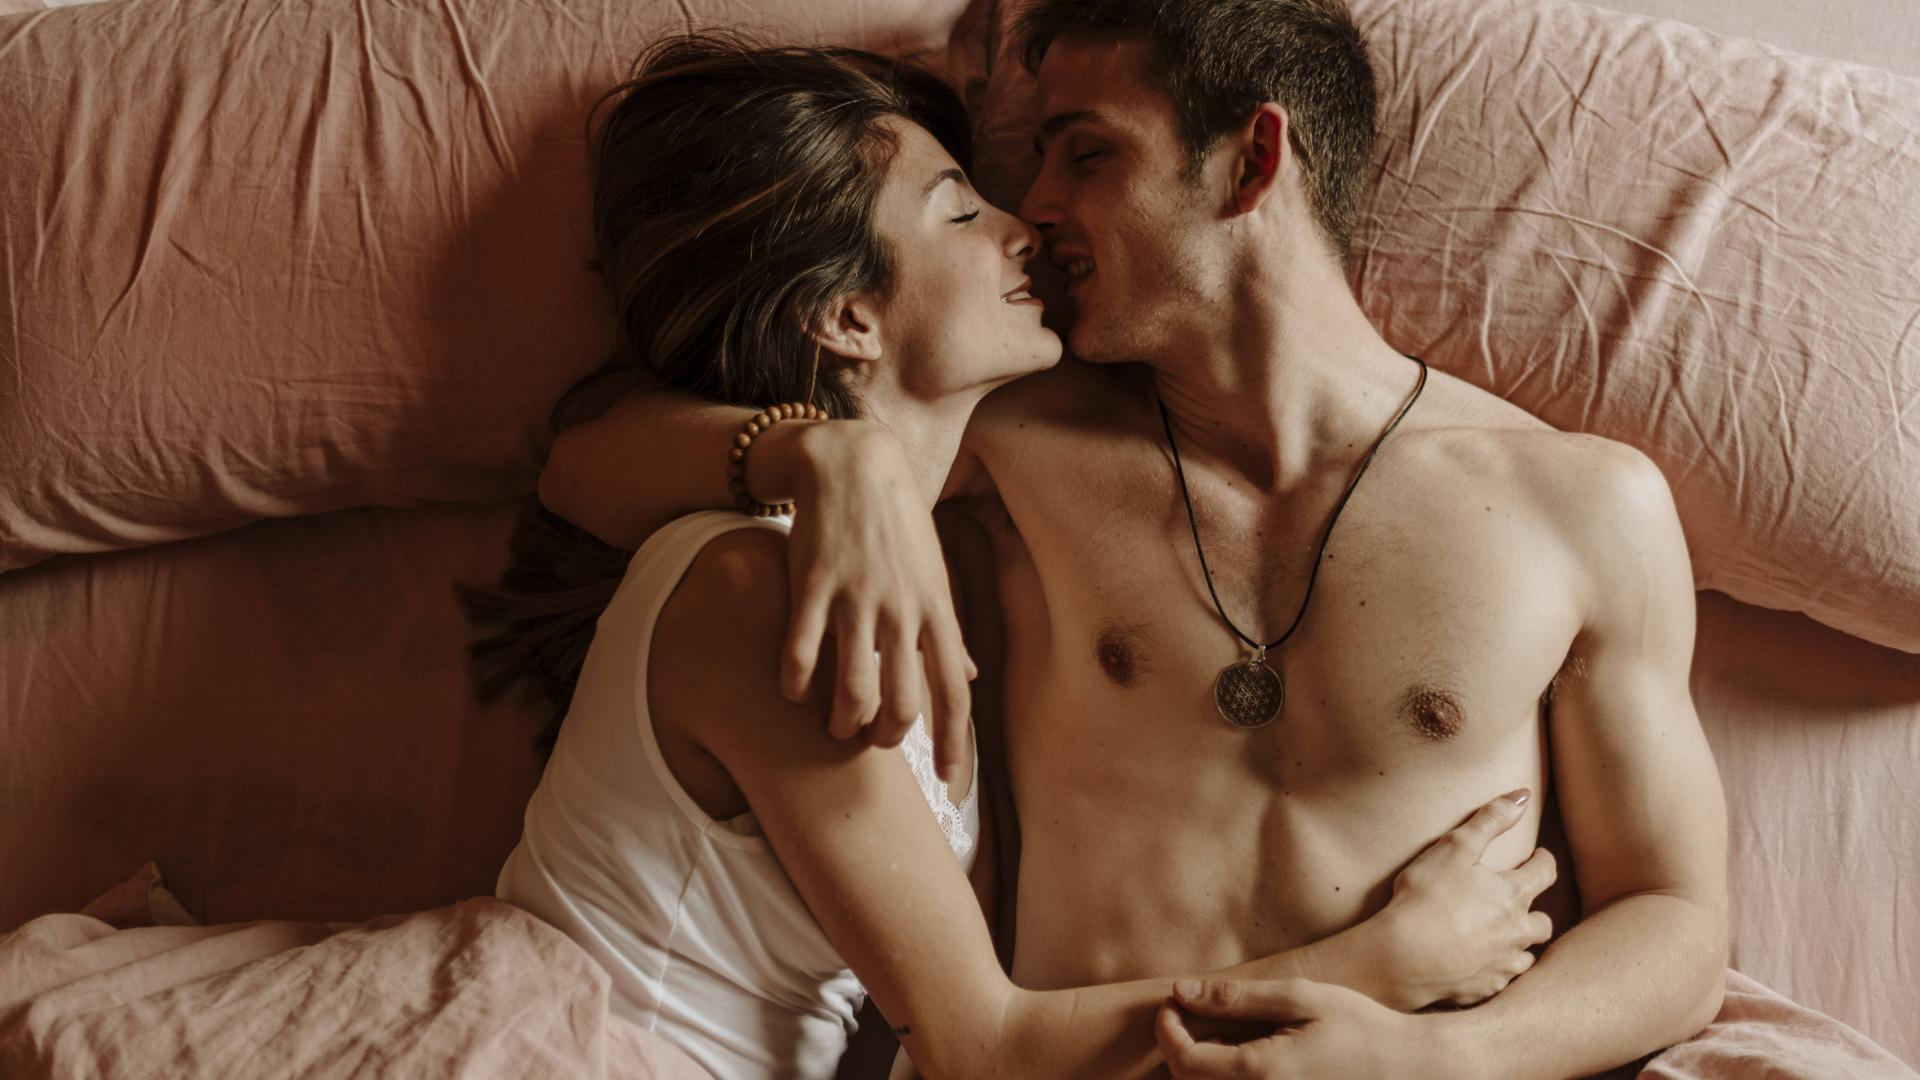 Couple Bed happy